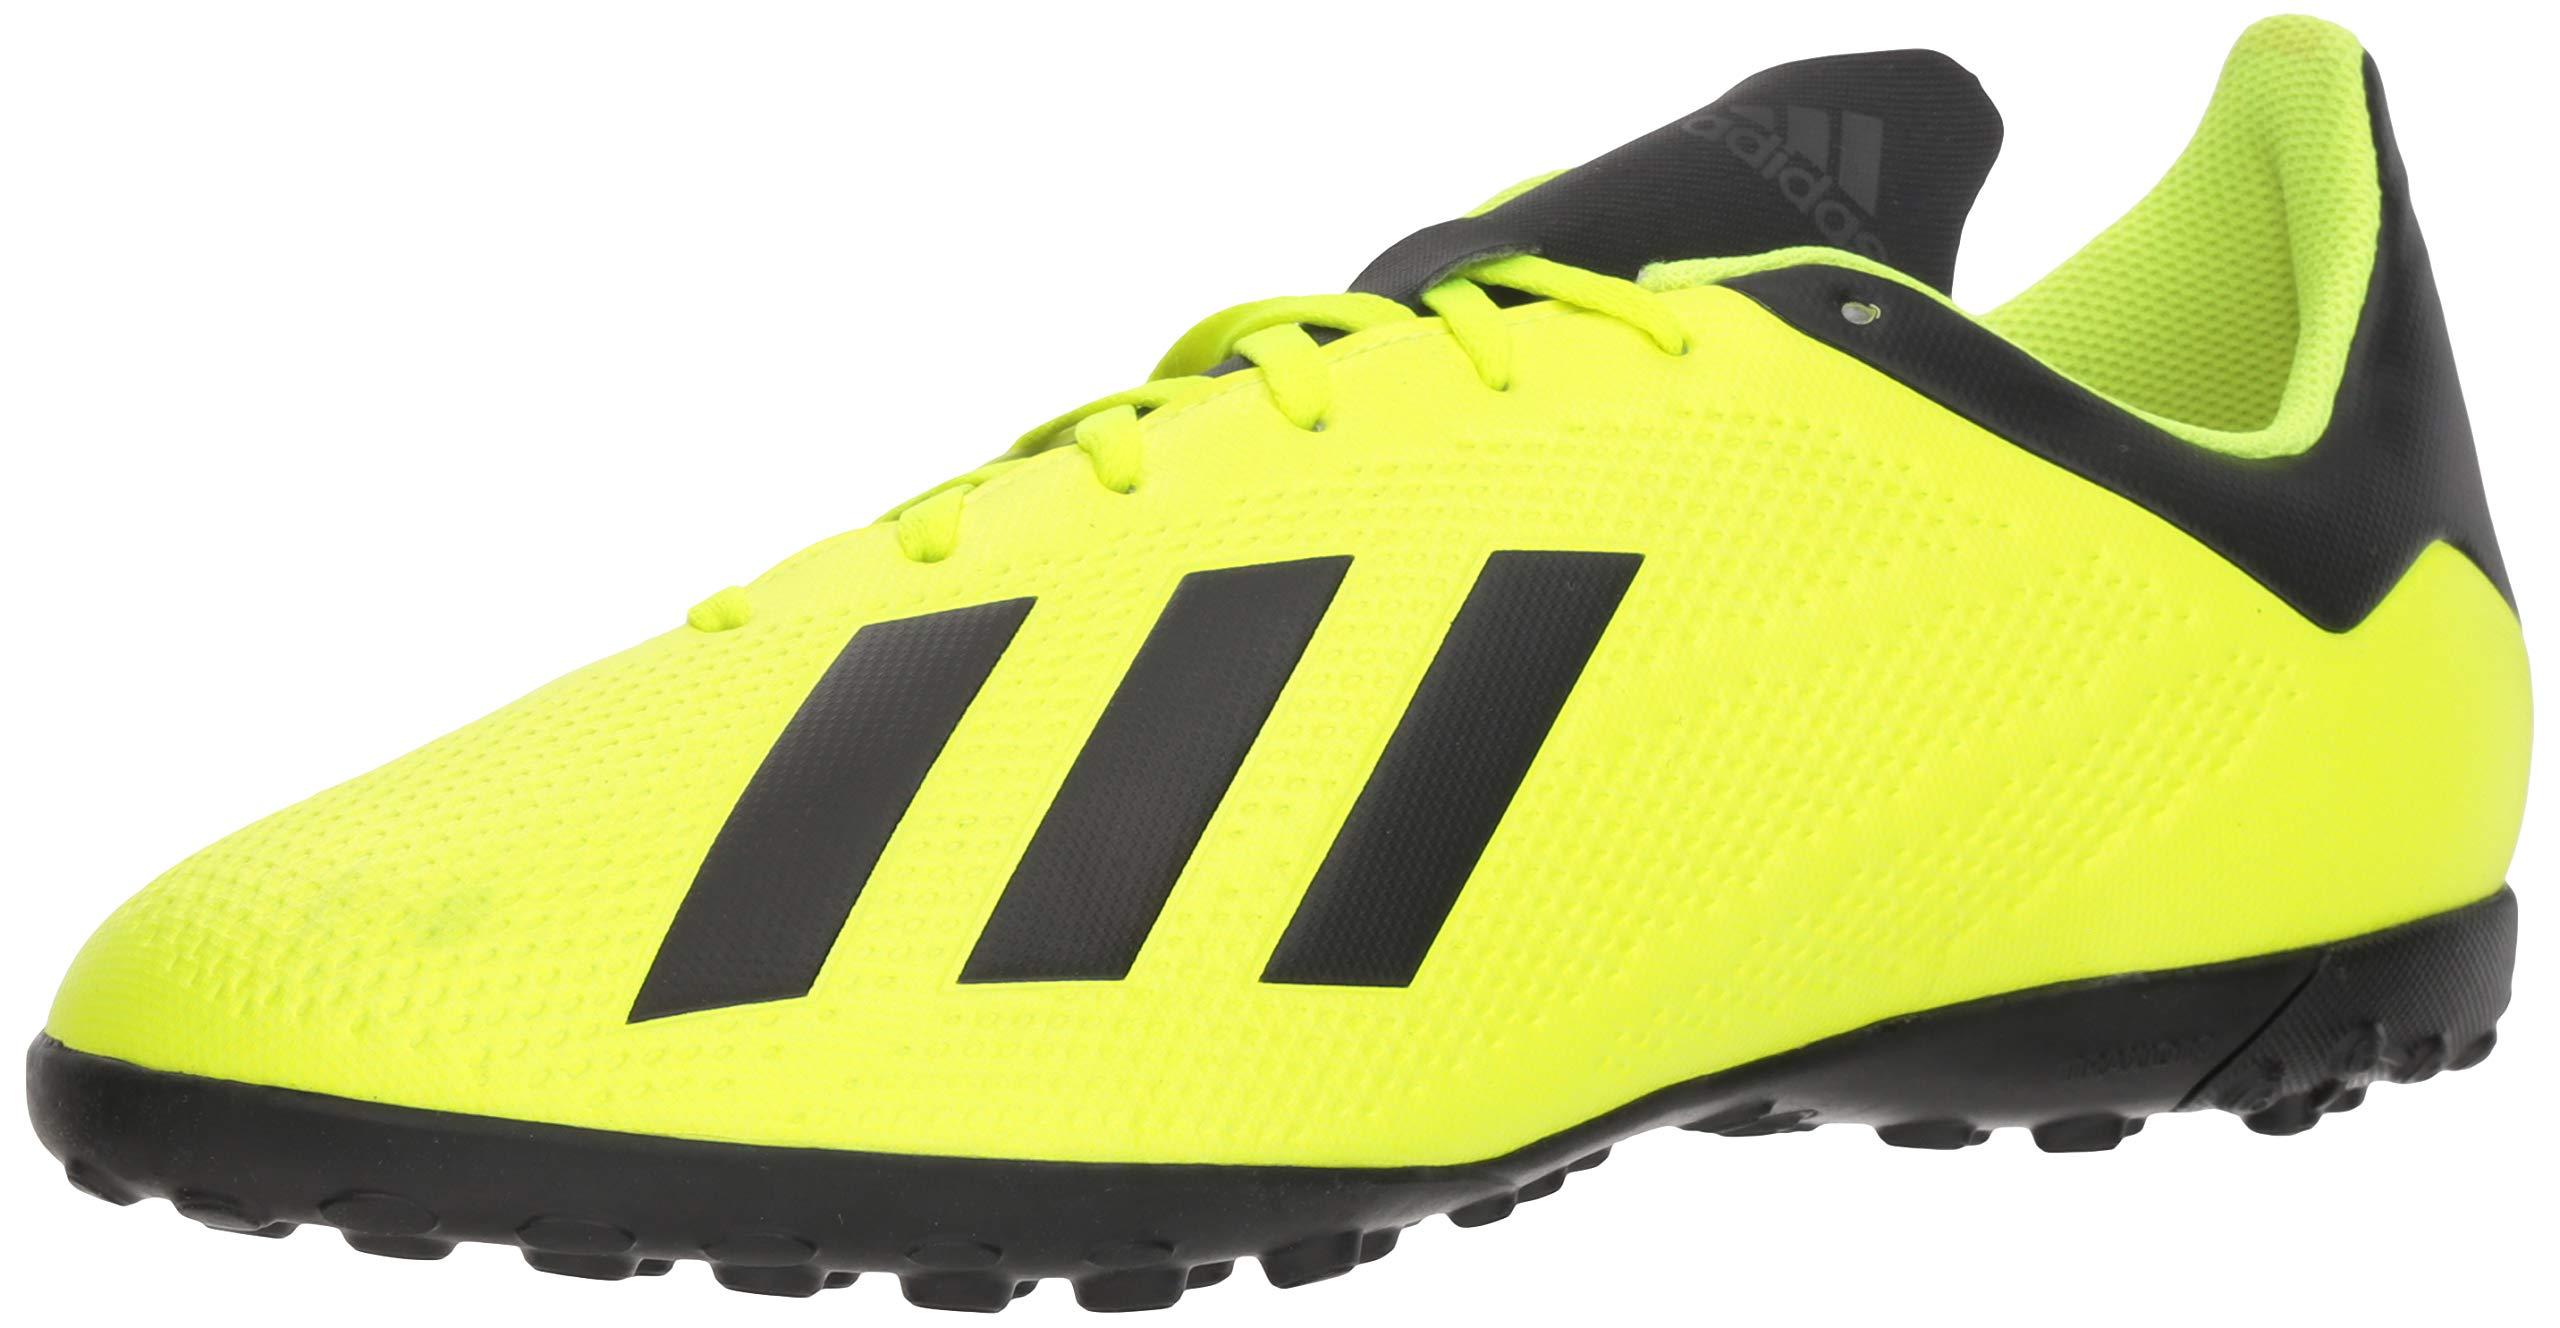 adidas Men's X Tango 18.4 Turf Soccer Shoe, Solar Yellow/Black/White, 7.5 M US